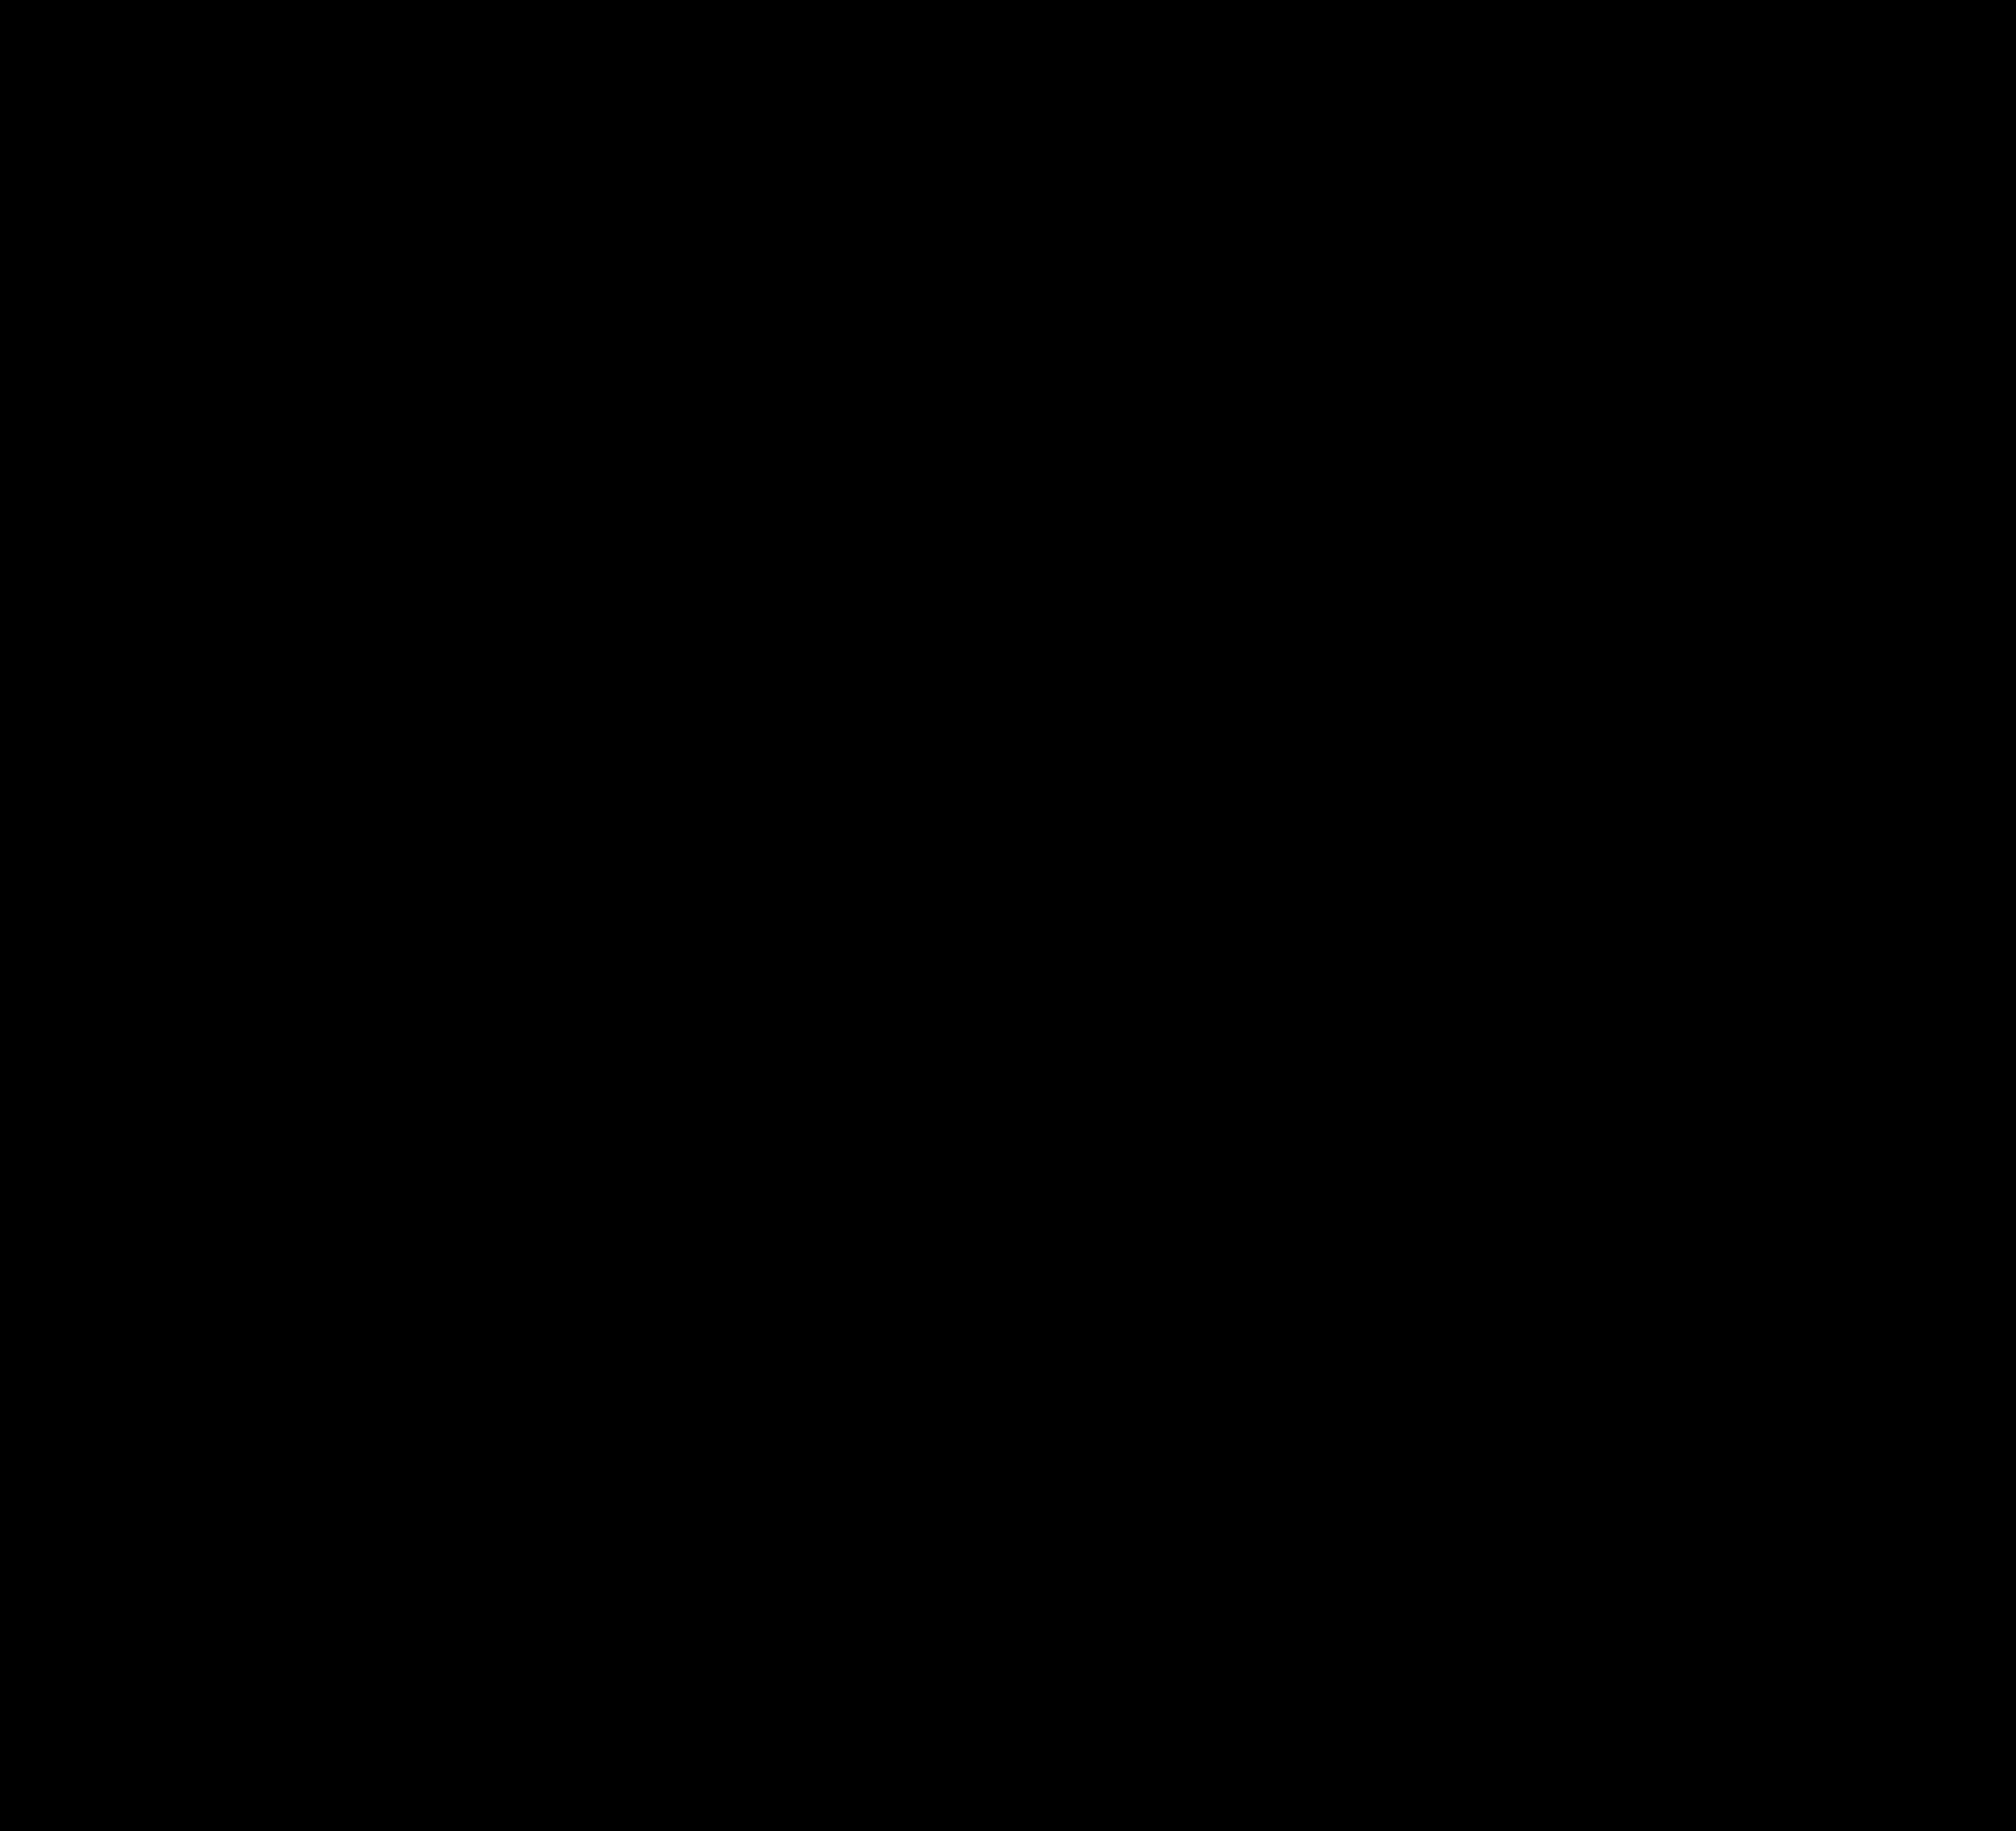 Gemini PNG Image SVG Clip arts